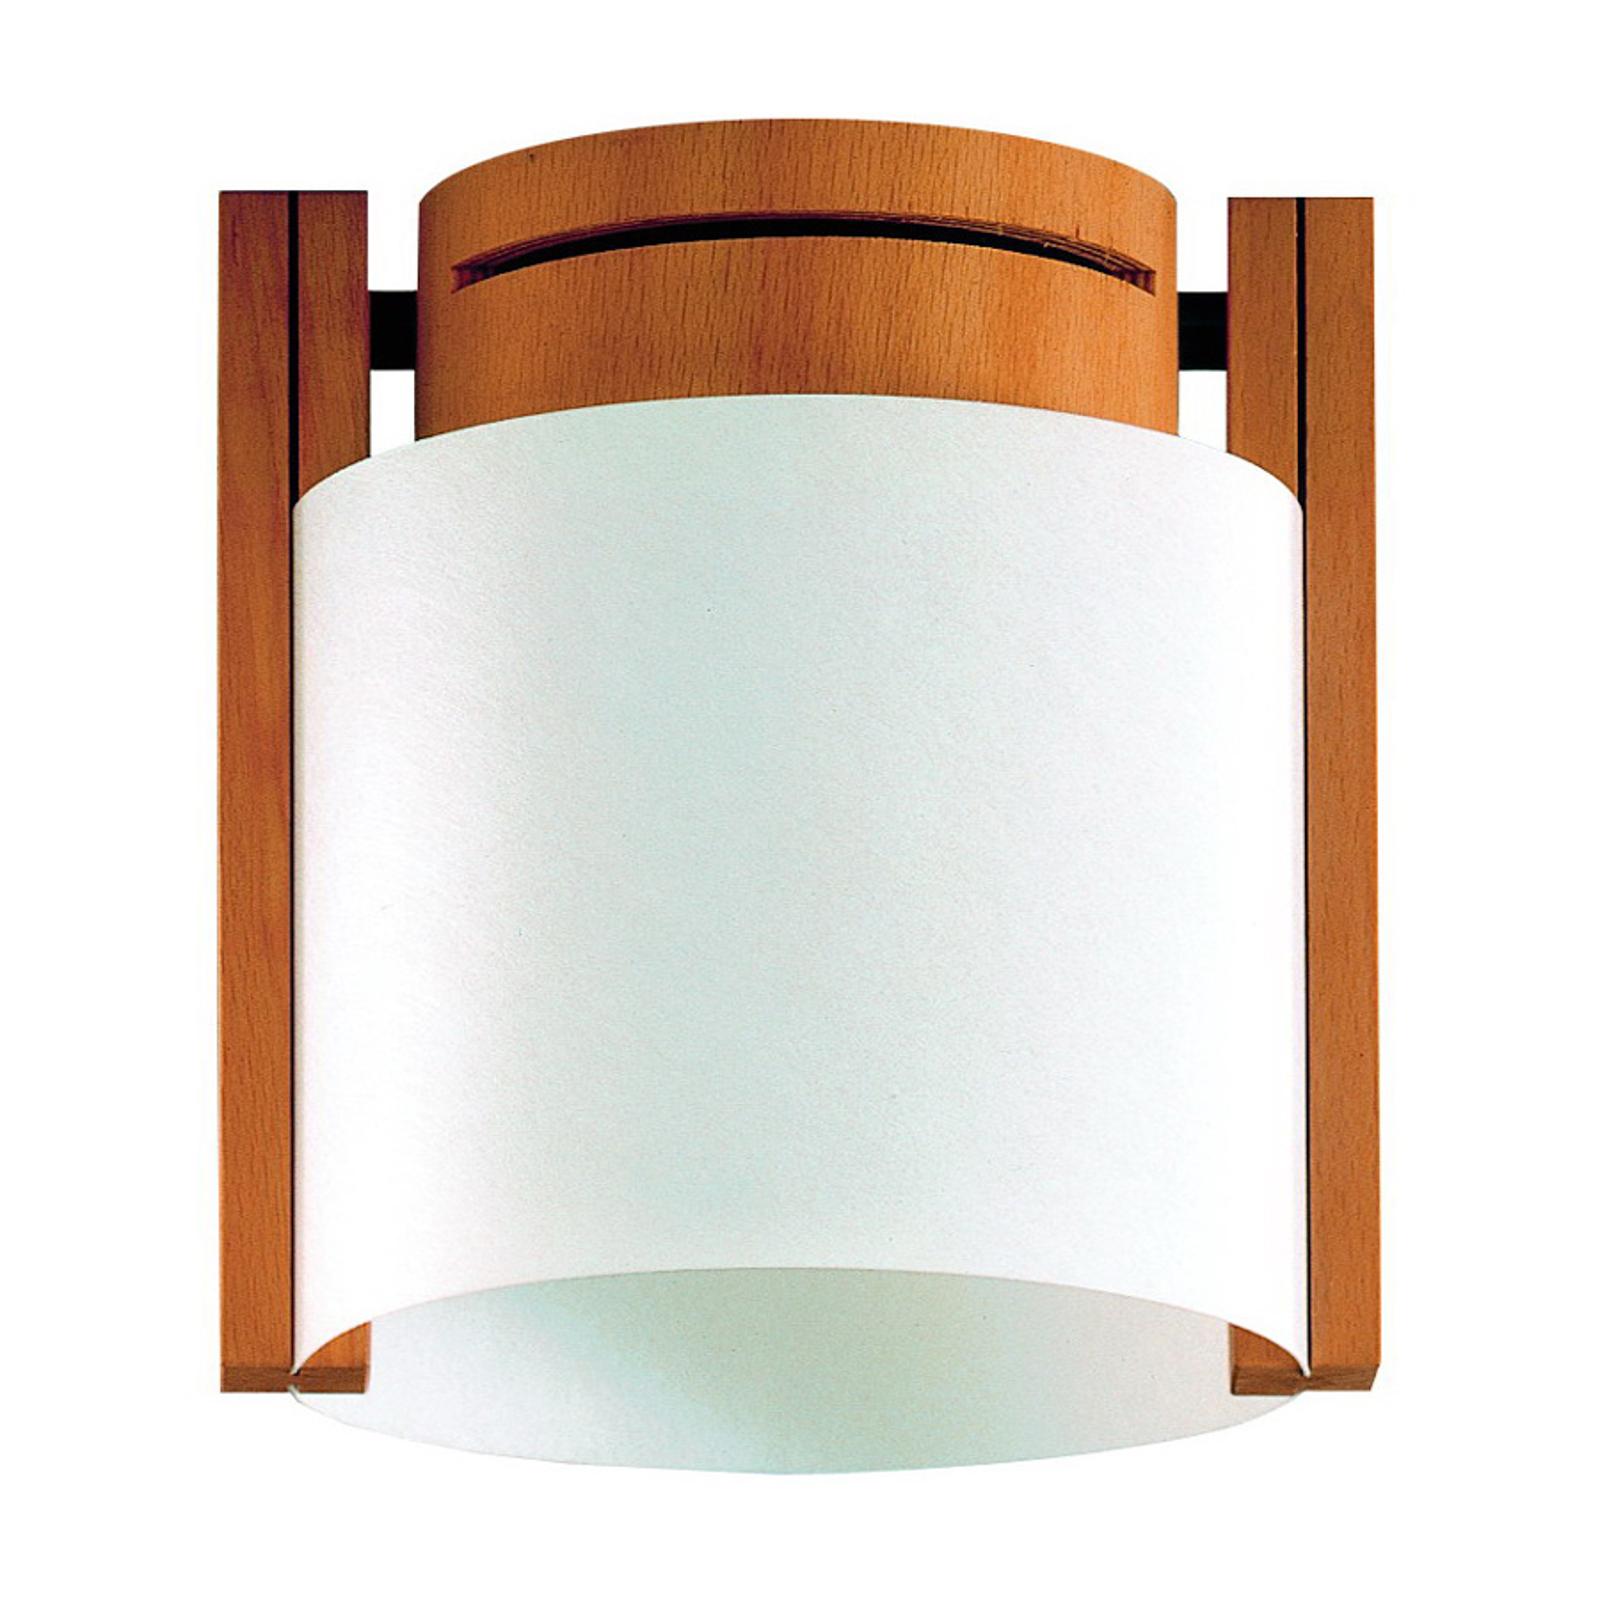 Plafondlamp DRUM